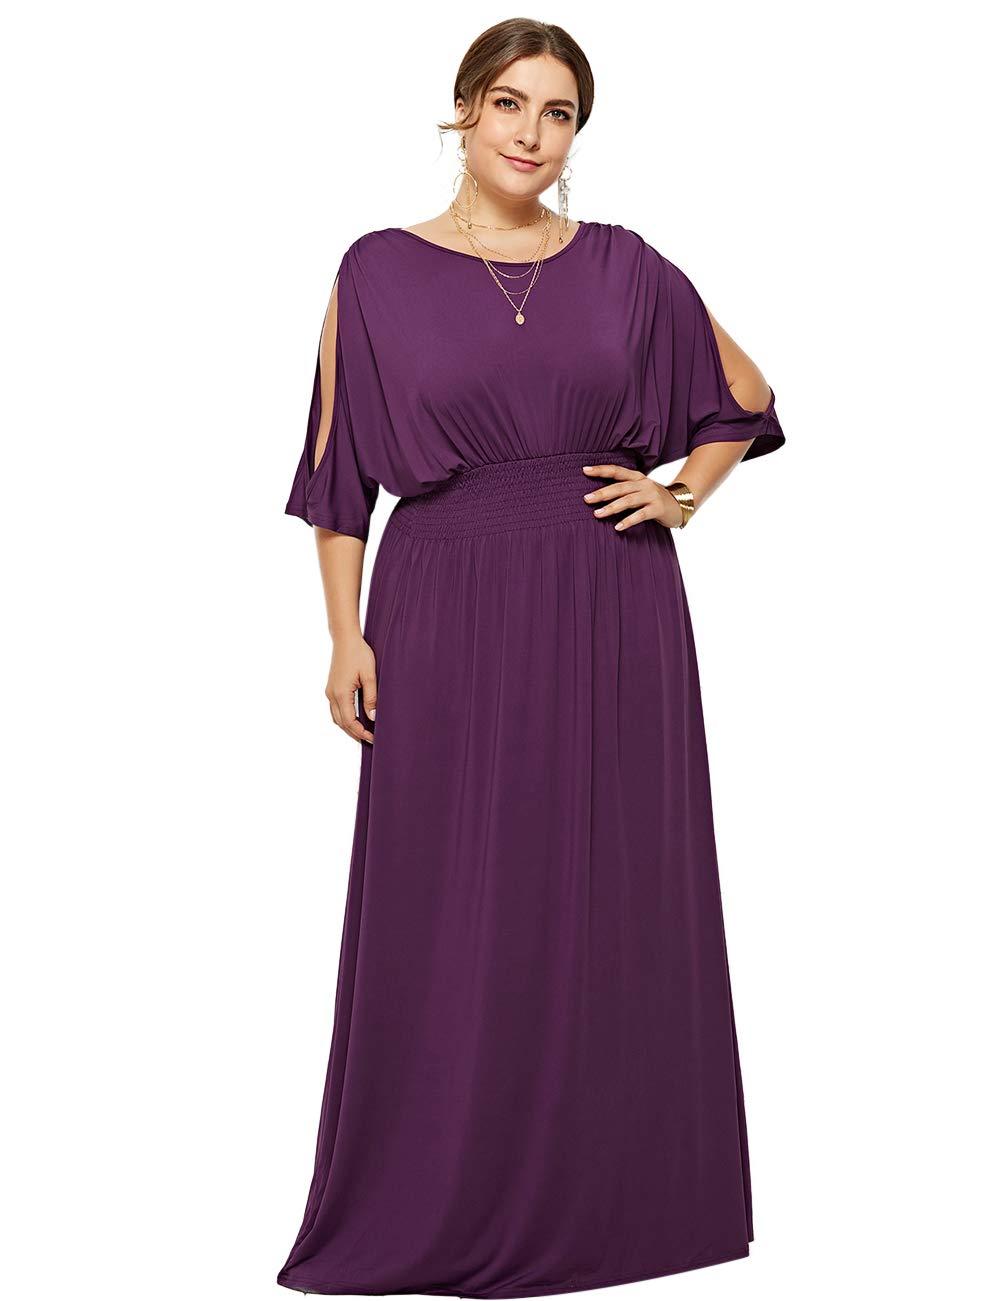 Lovelychica Women Plus Size Dress Sexy Short Sleeve Plain Defined Waist Maxi Dress Purple by Lovelychica Dress